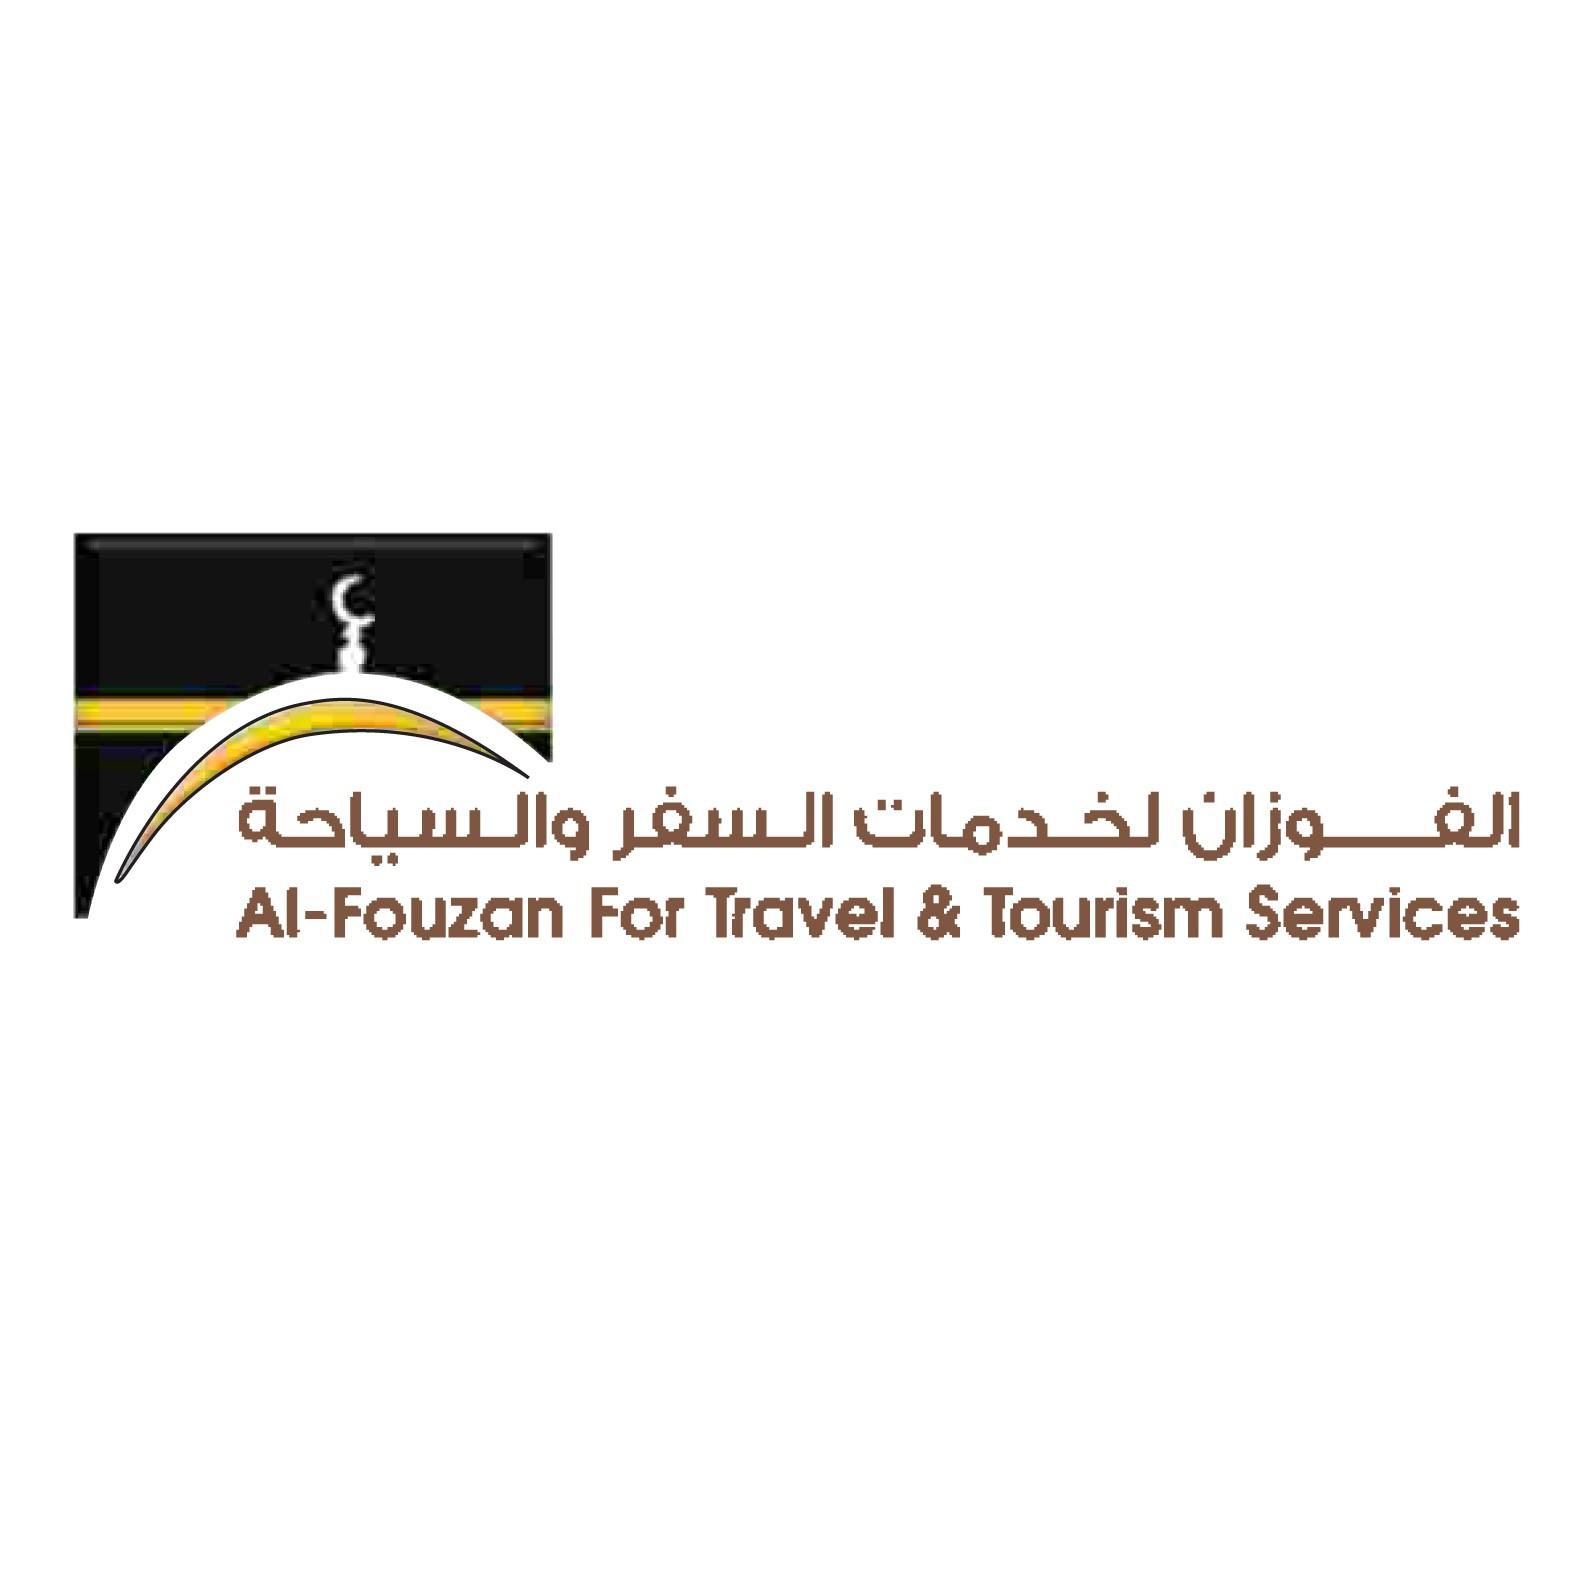 "alt=""الفوزان لخدمات السفر والسياحة"""